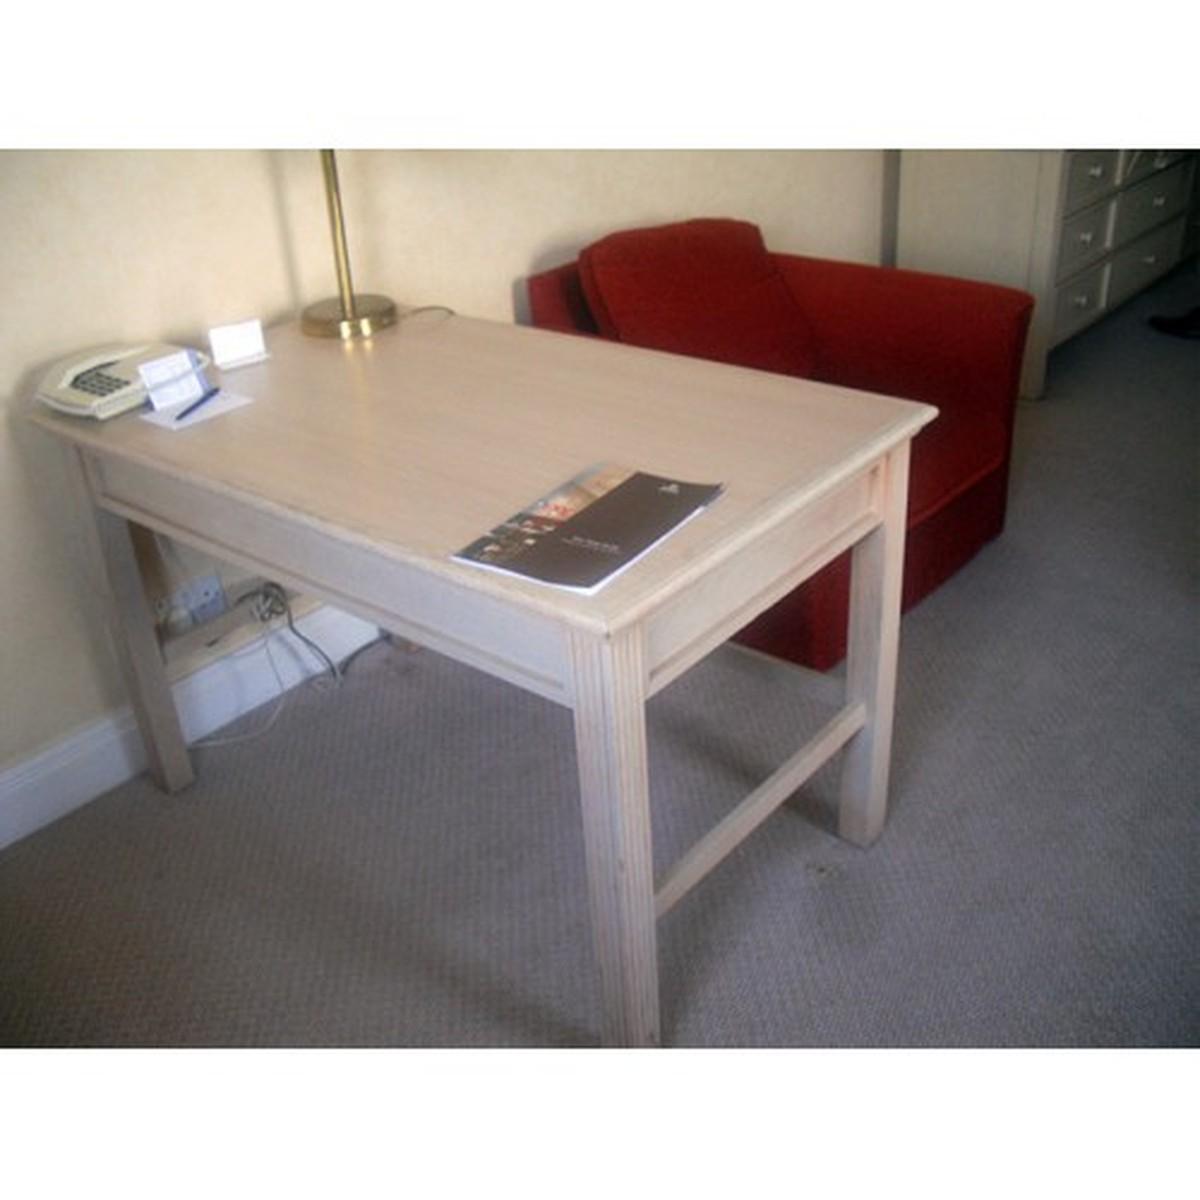 Secondhand Prop Shop Mayfair Furniture Caterfair